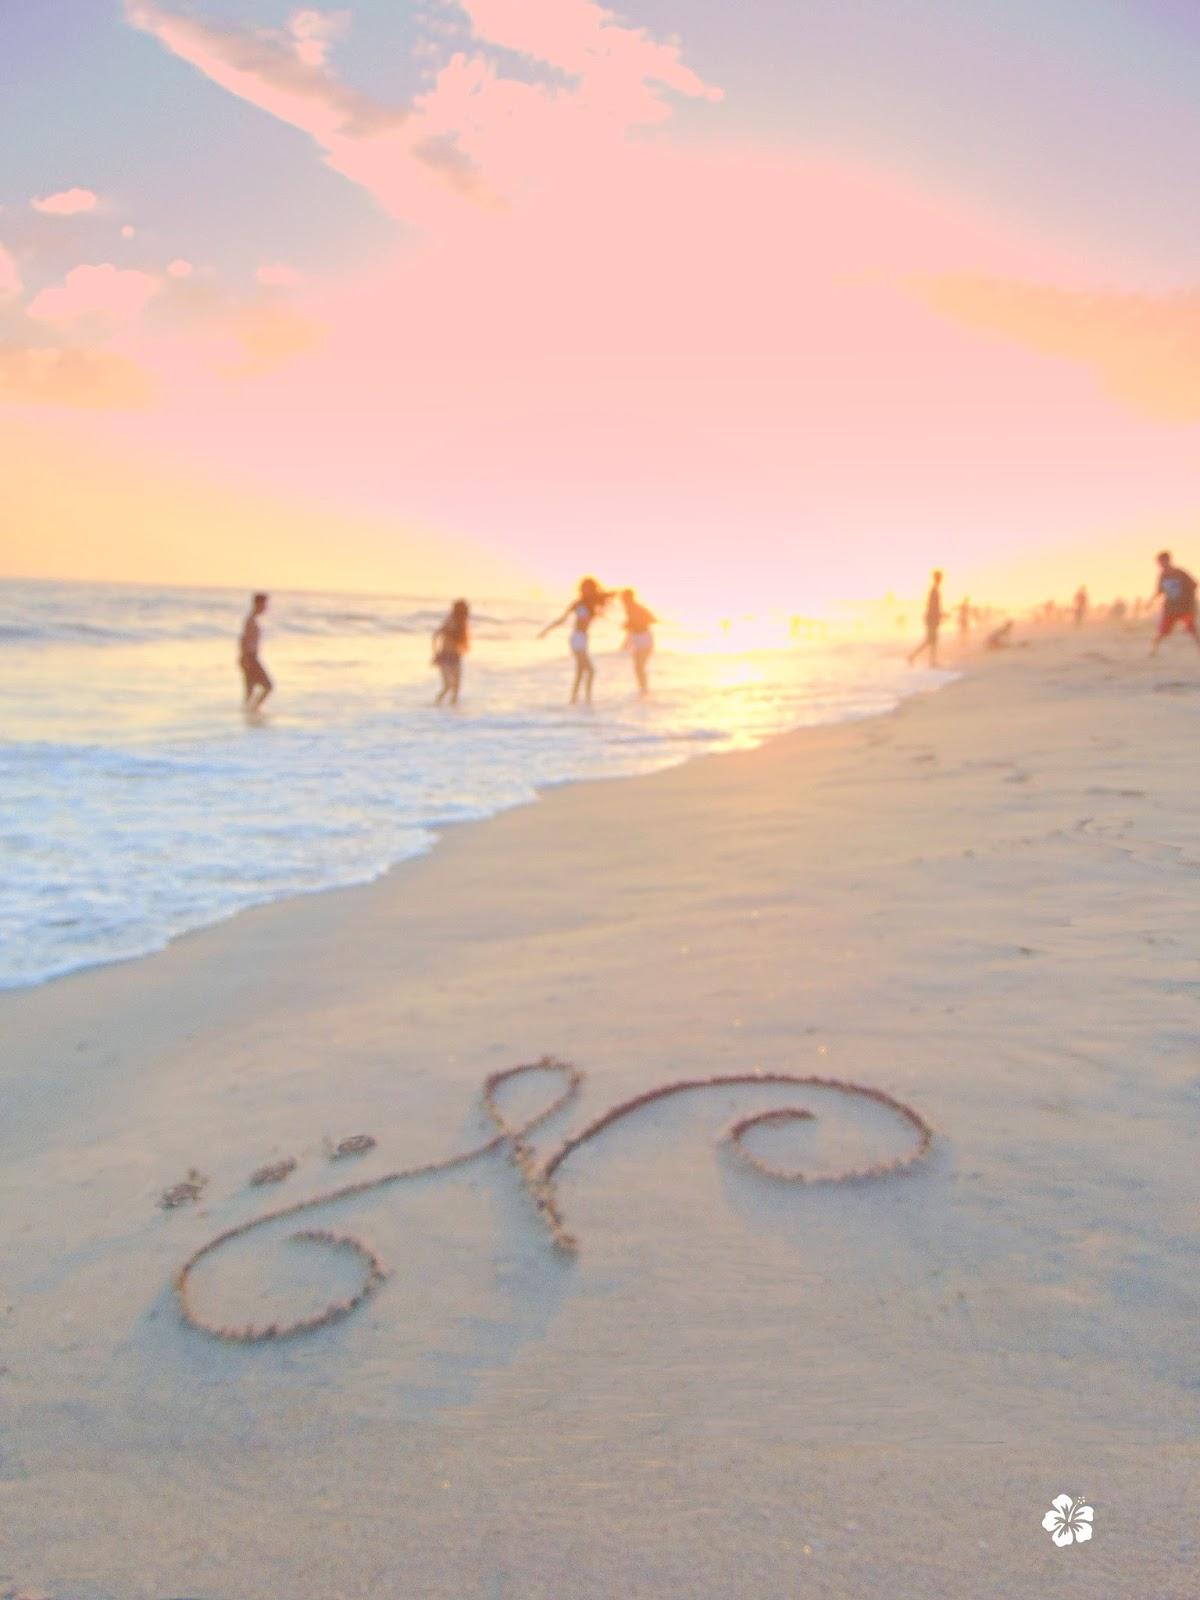 Lisas hawaiian sandwriting zibu angelic symbols healing biocorpaavc Image collections